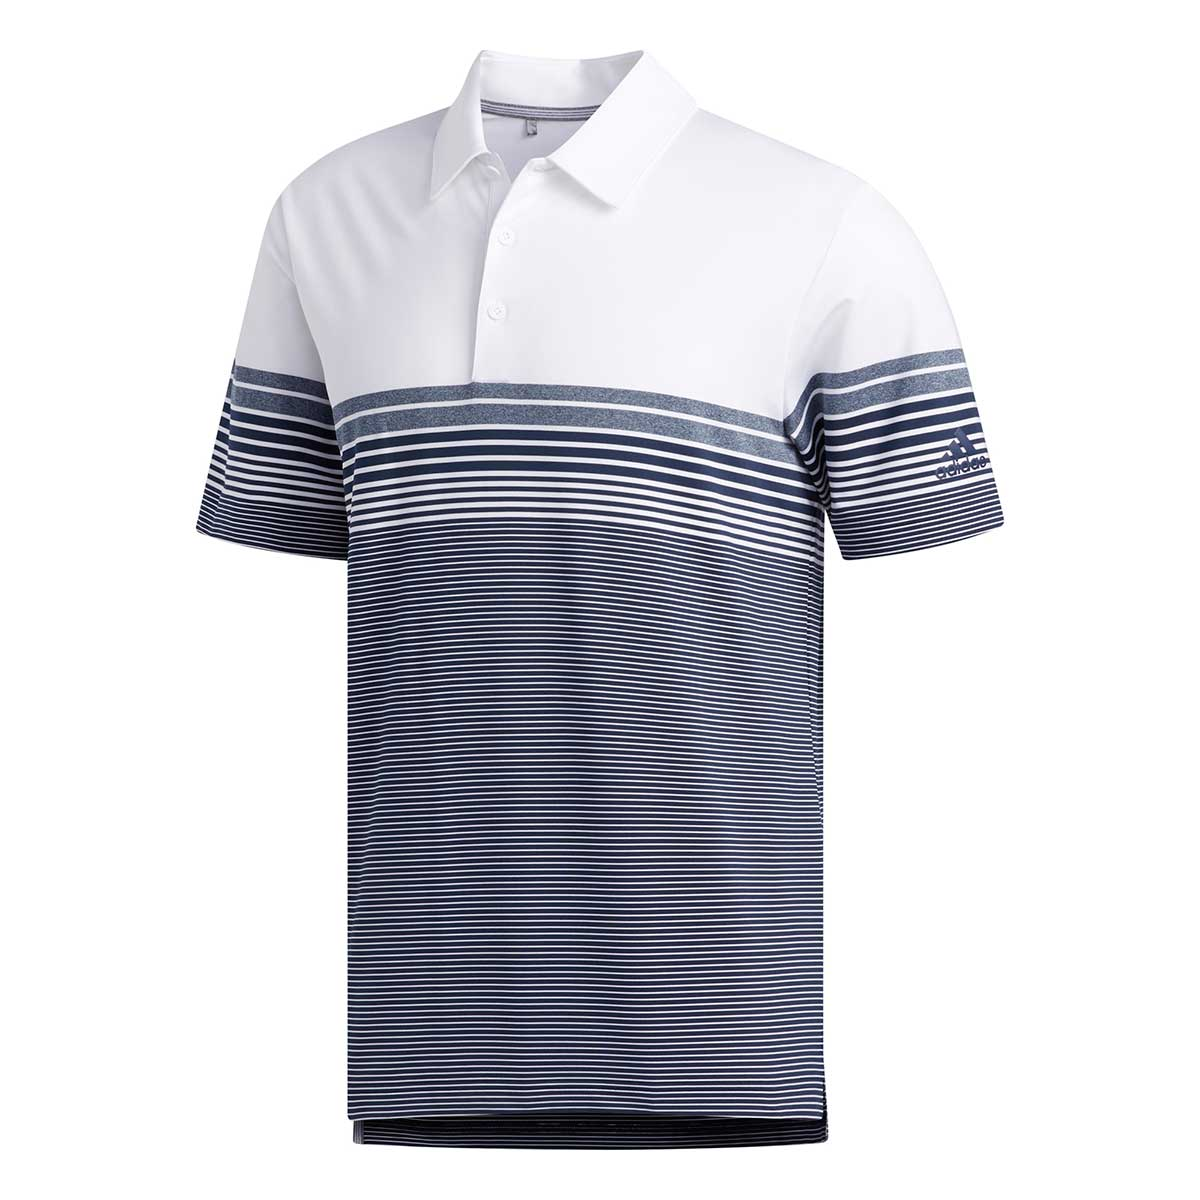 Adidas Men's Ultimate365 Gradient Block Stripe White/Navy Polo